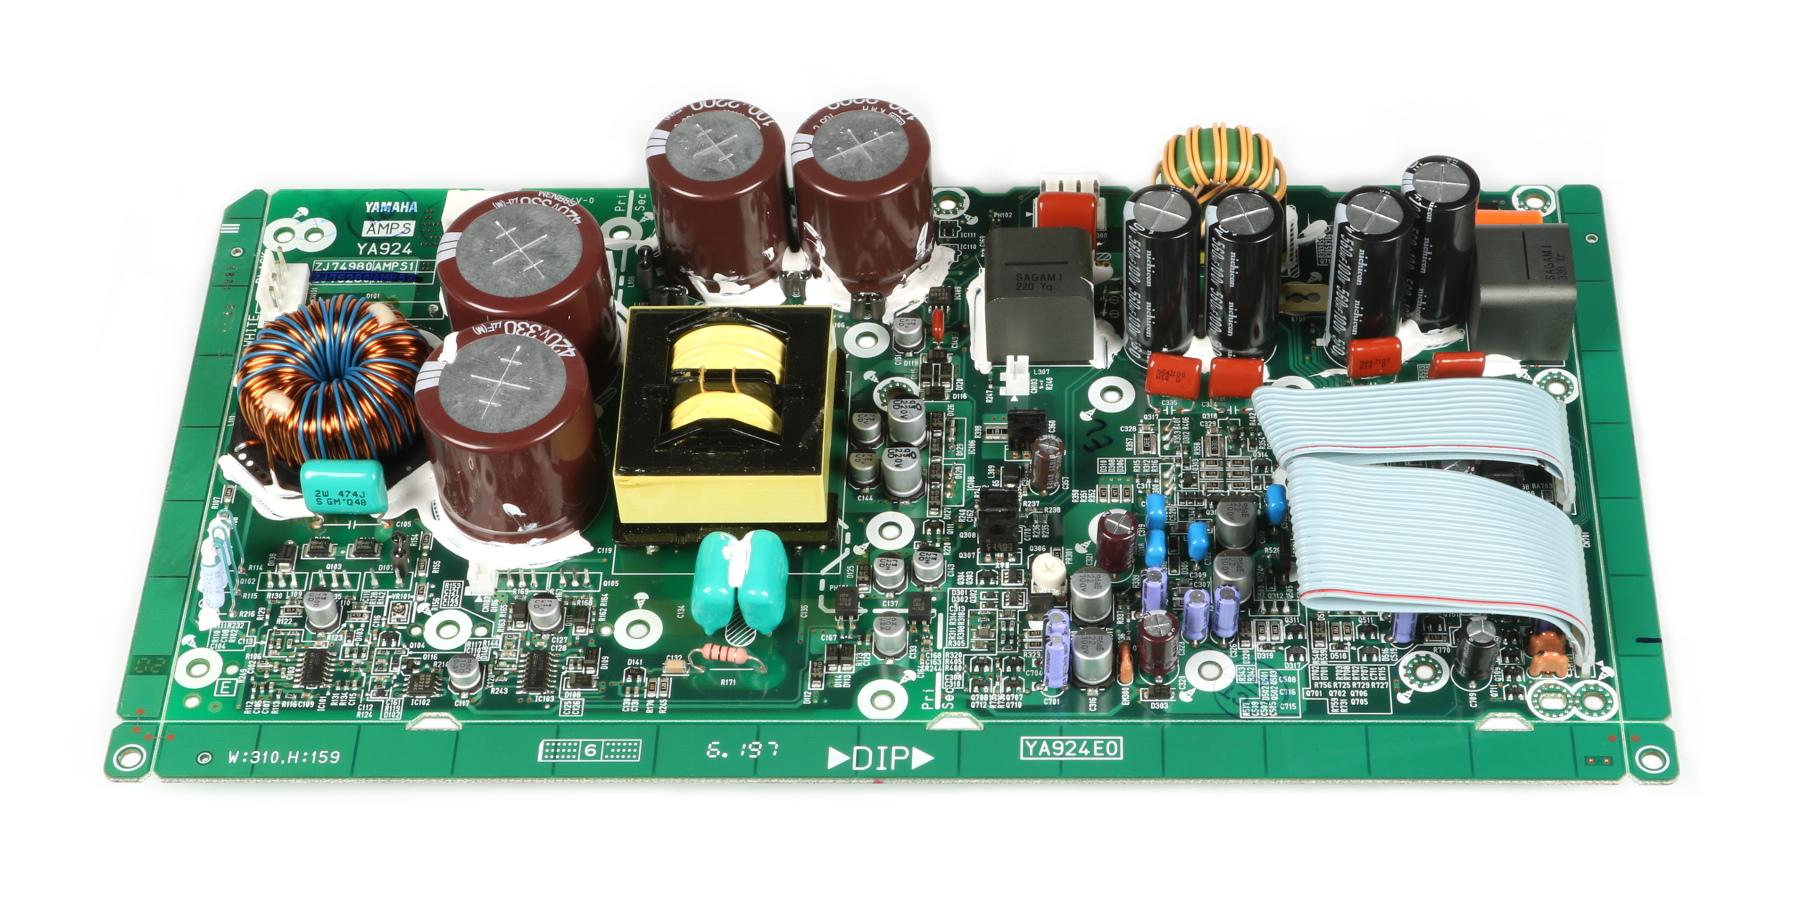 Amp PCB Assembly for DSR112, DSR115, and DSR215